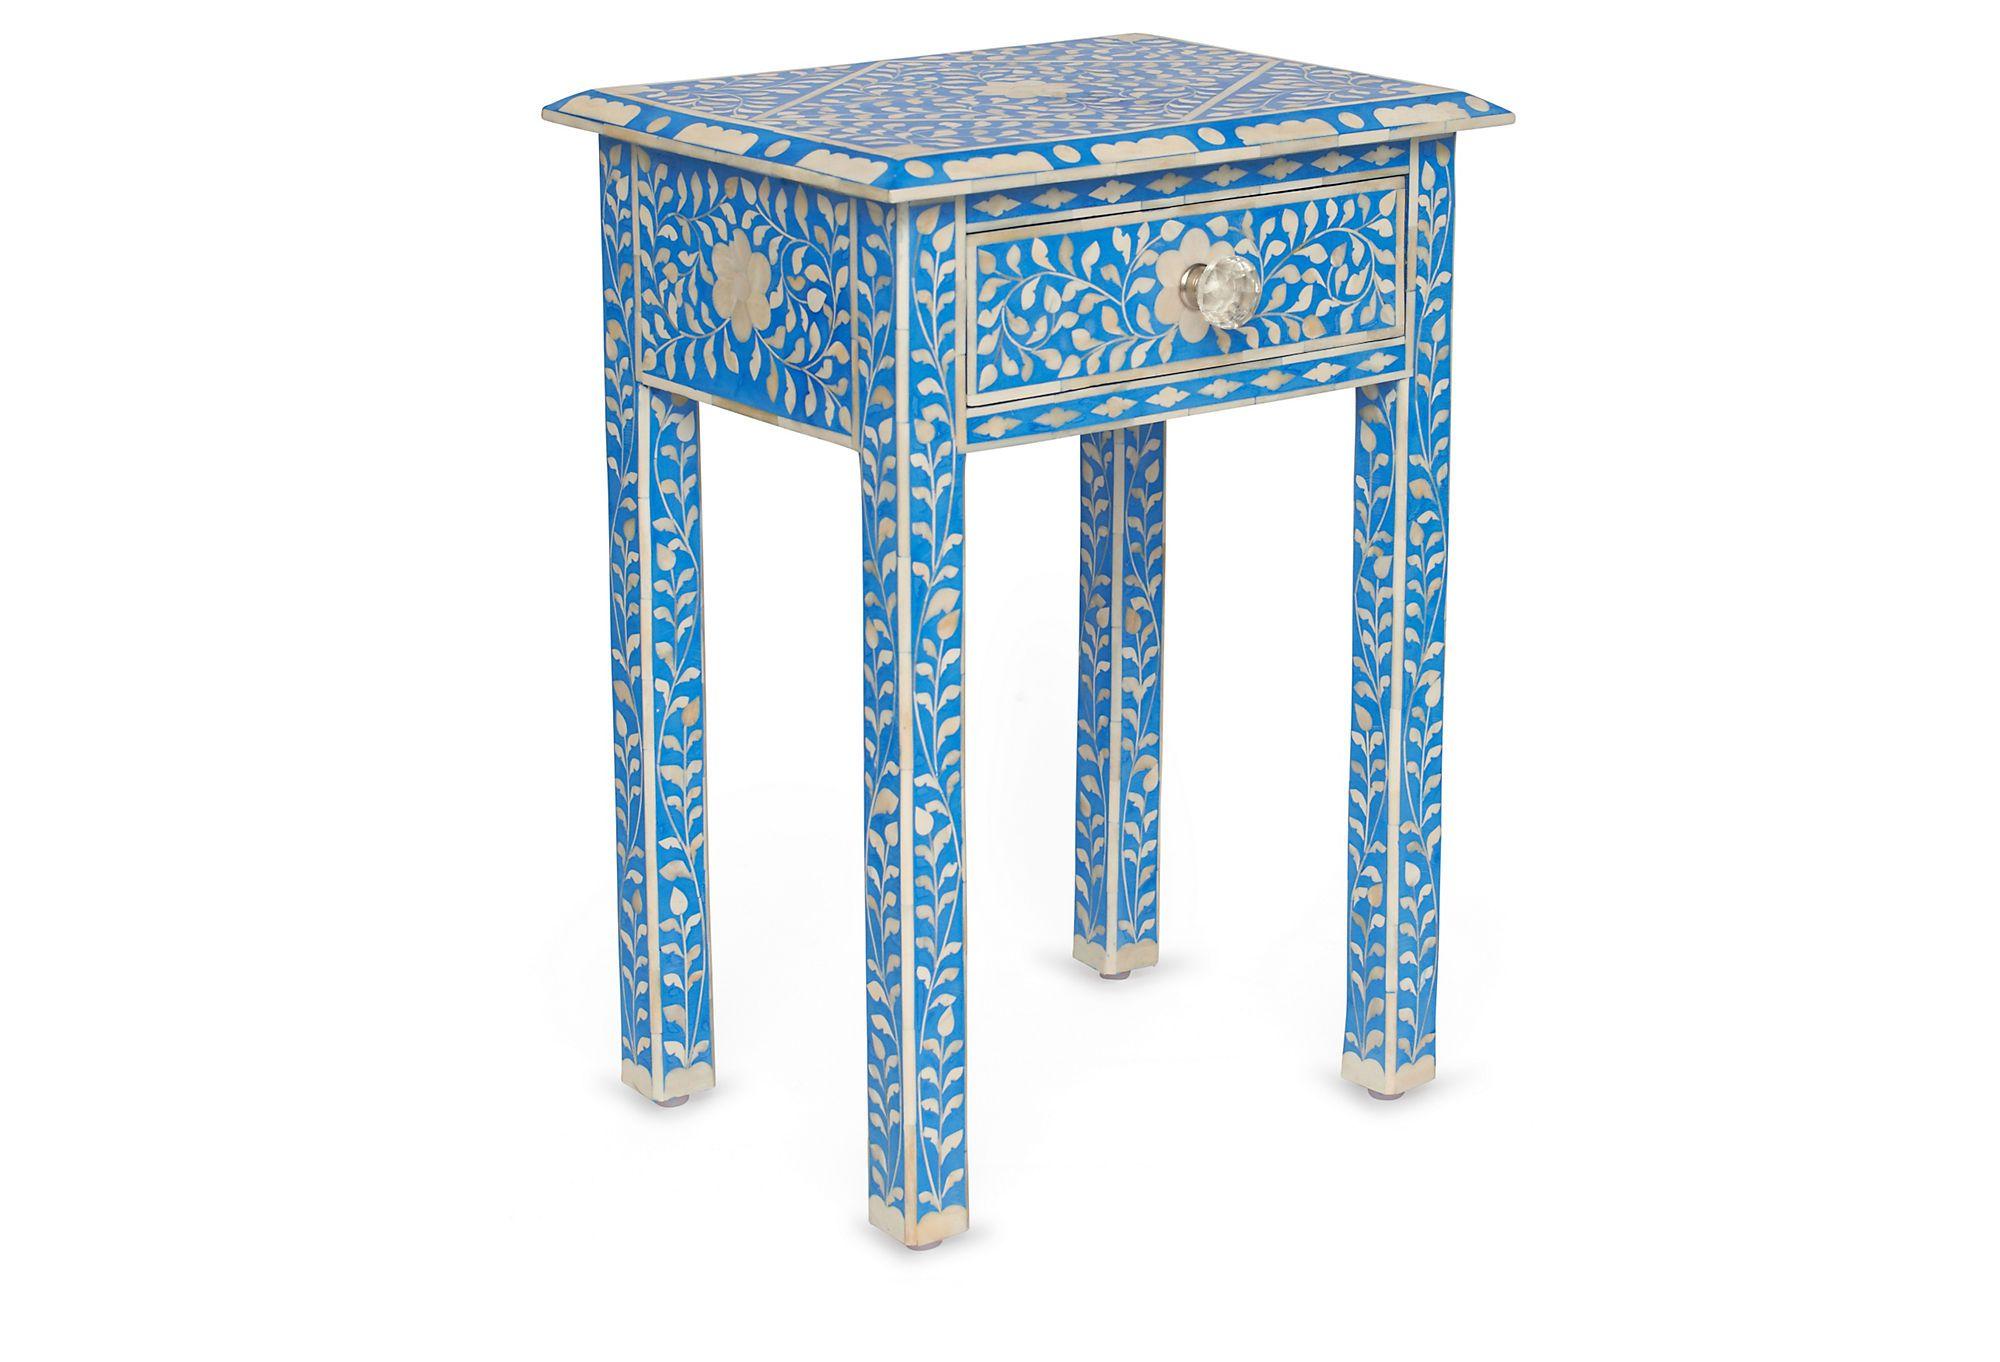 "Morrocan Bone Inlay Side Table, Indigo | 25""H x 14""D x 18""W"